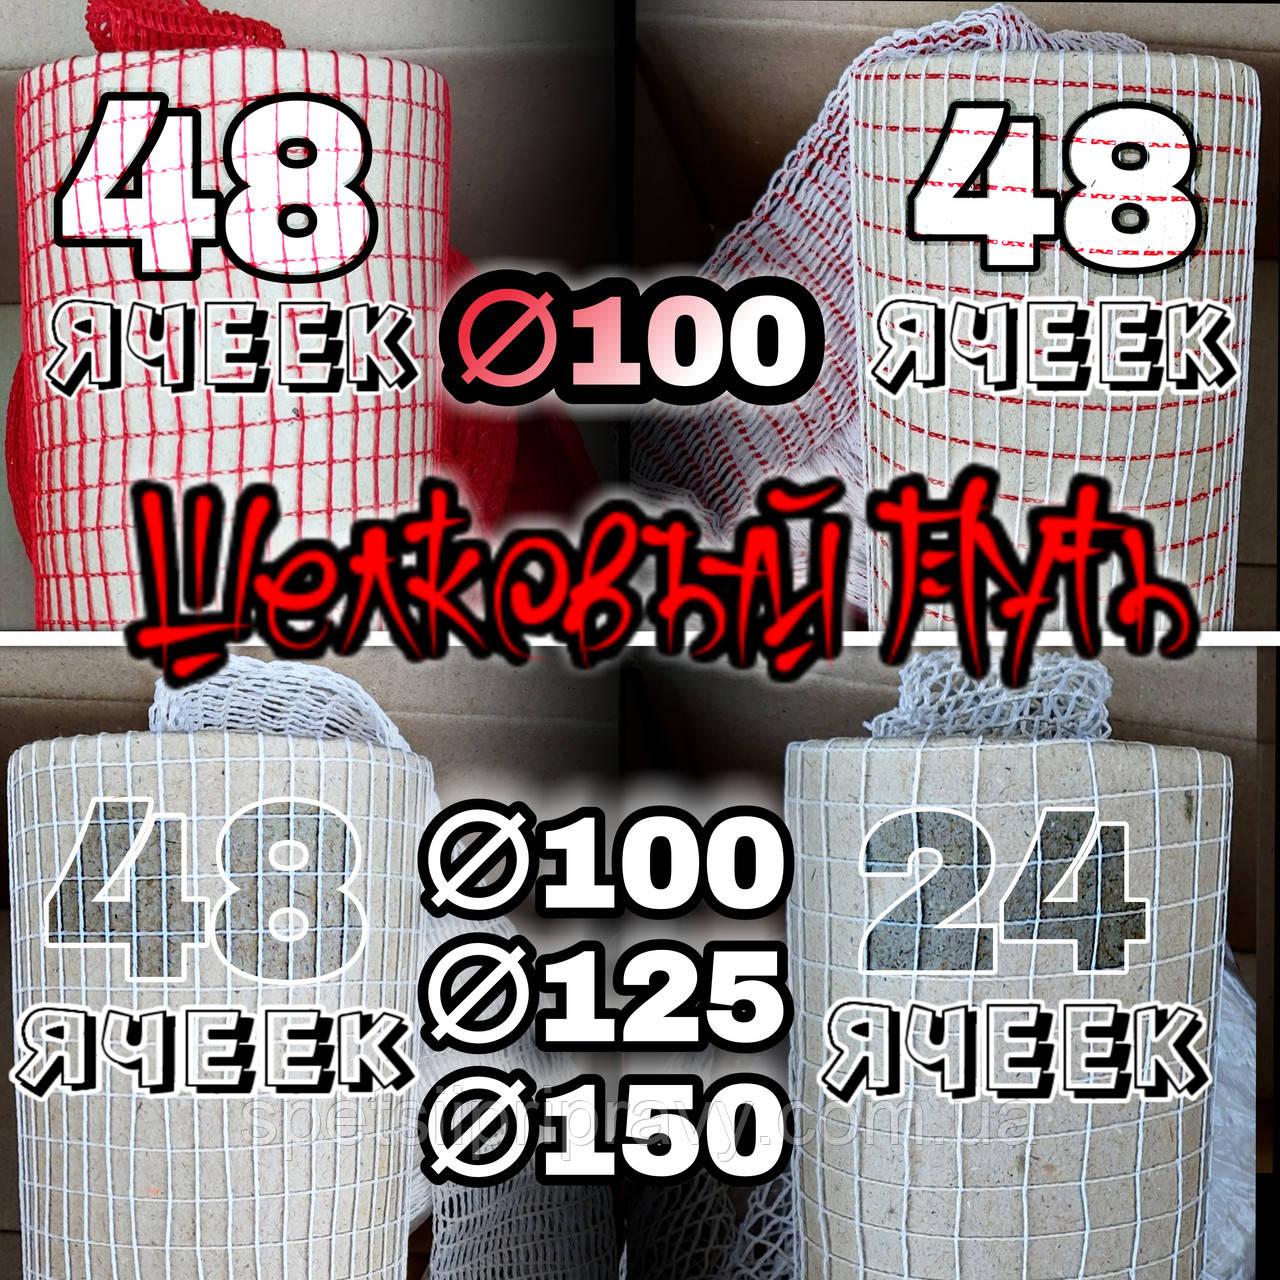 Сетка эластичная для мяса 10м, ∅100/48 ячейки, красная